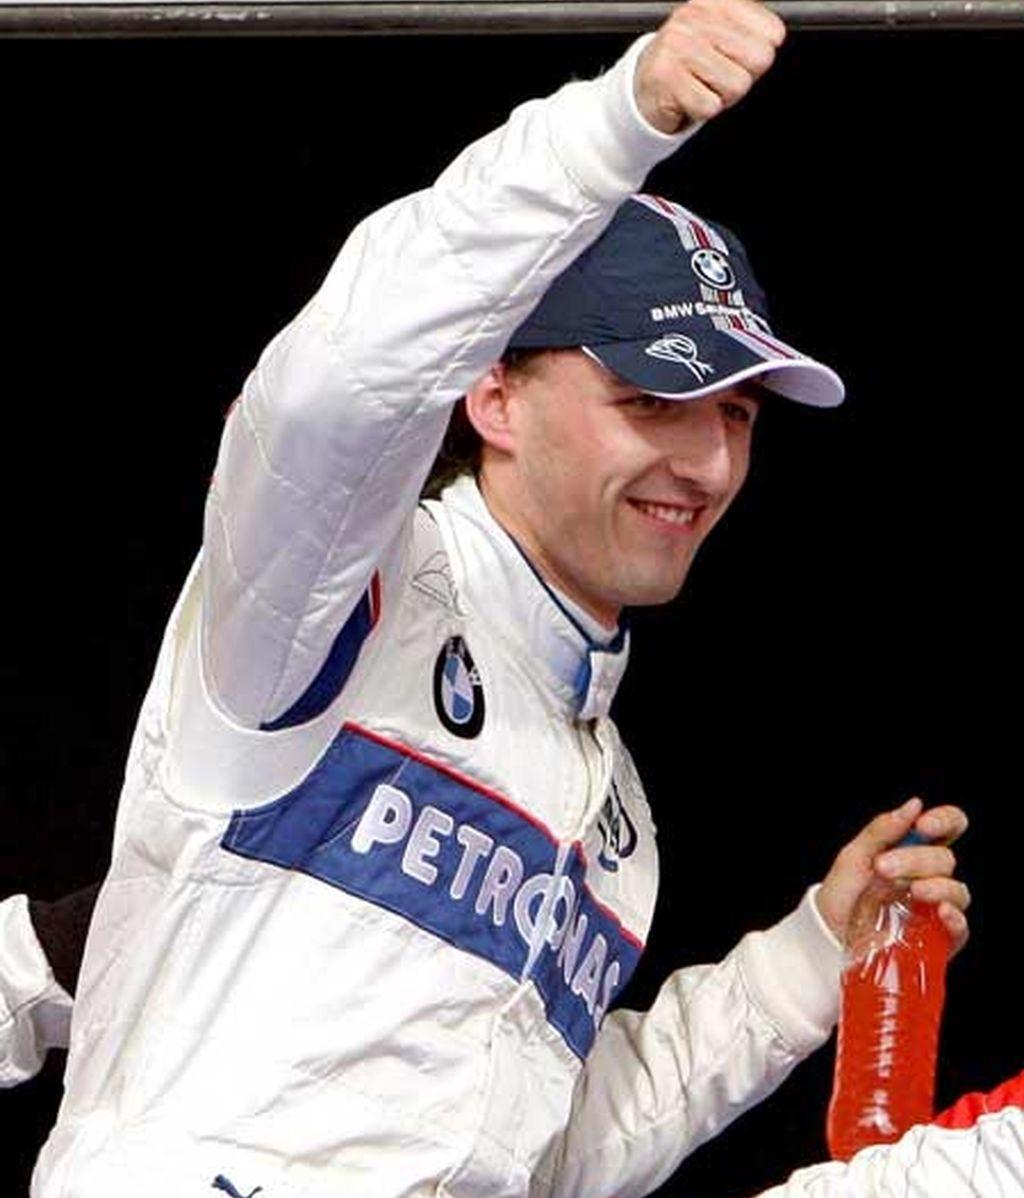 Pole position para Kubica